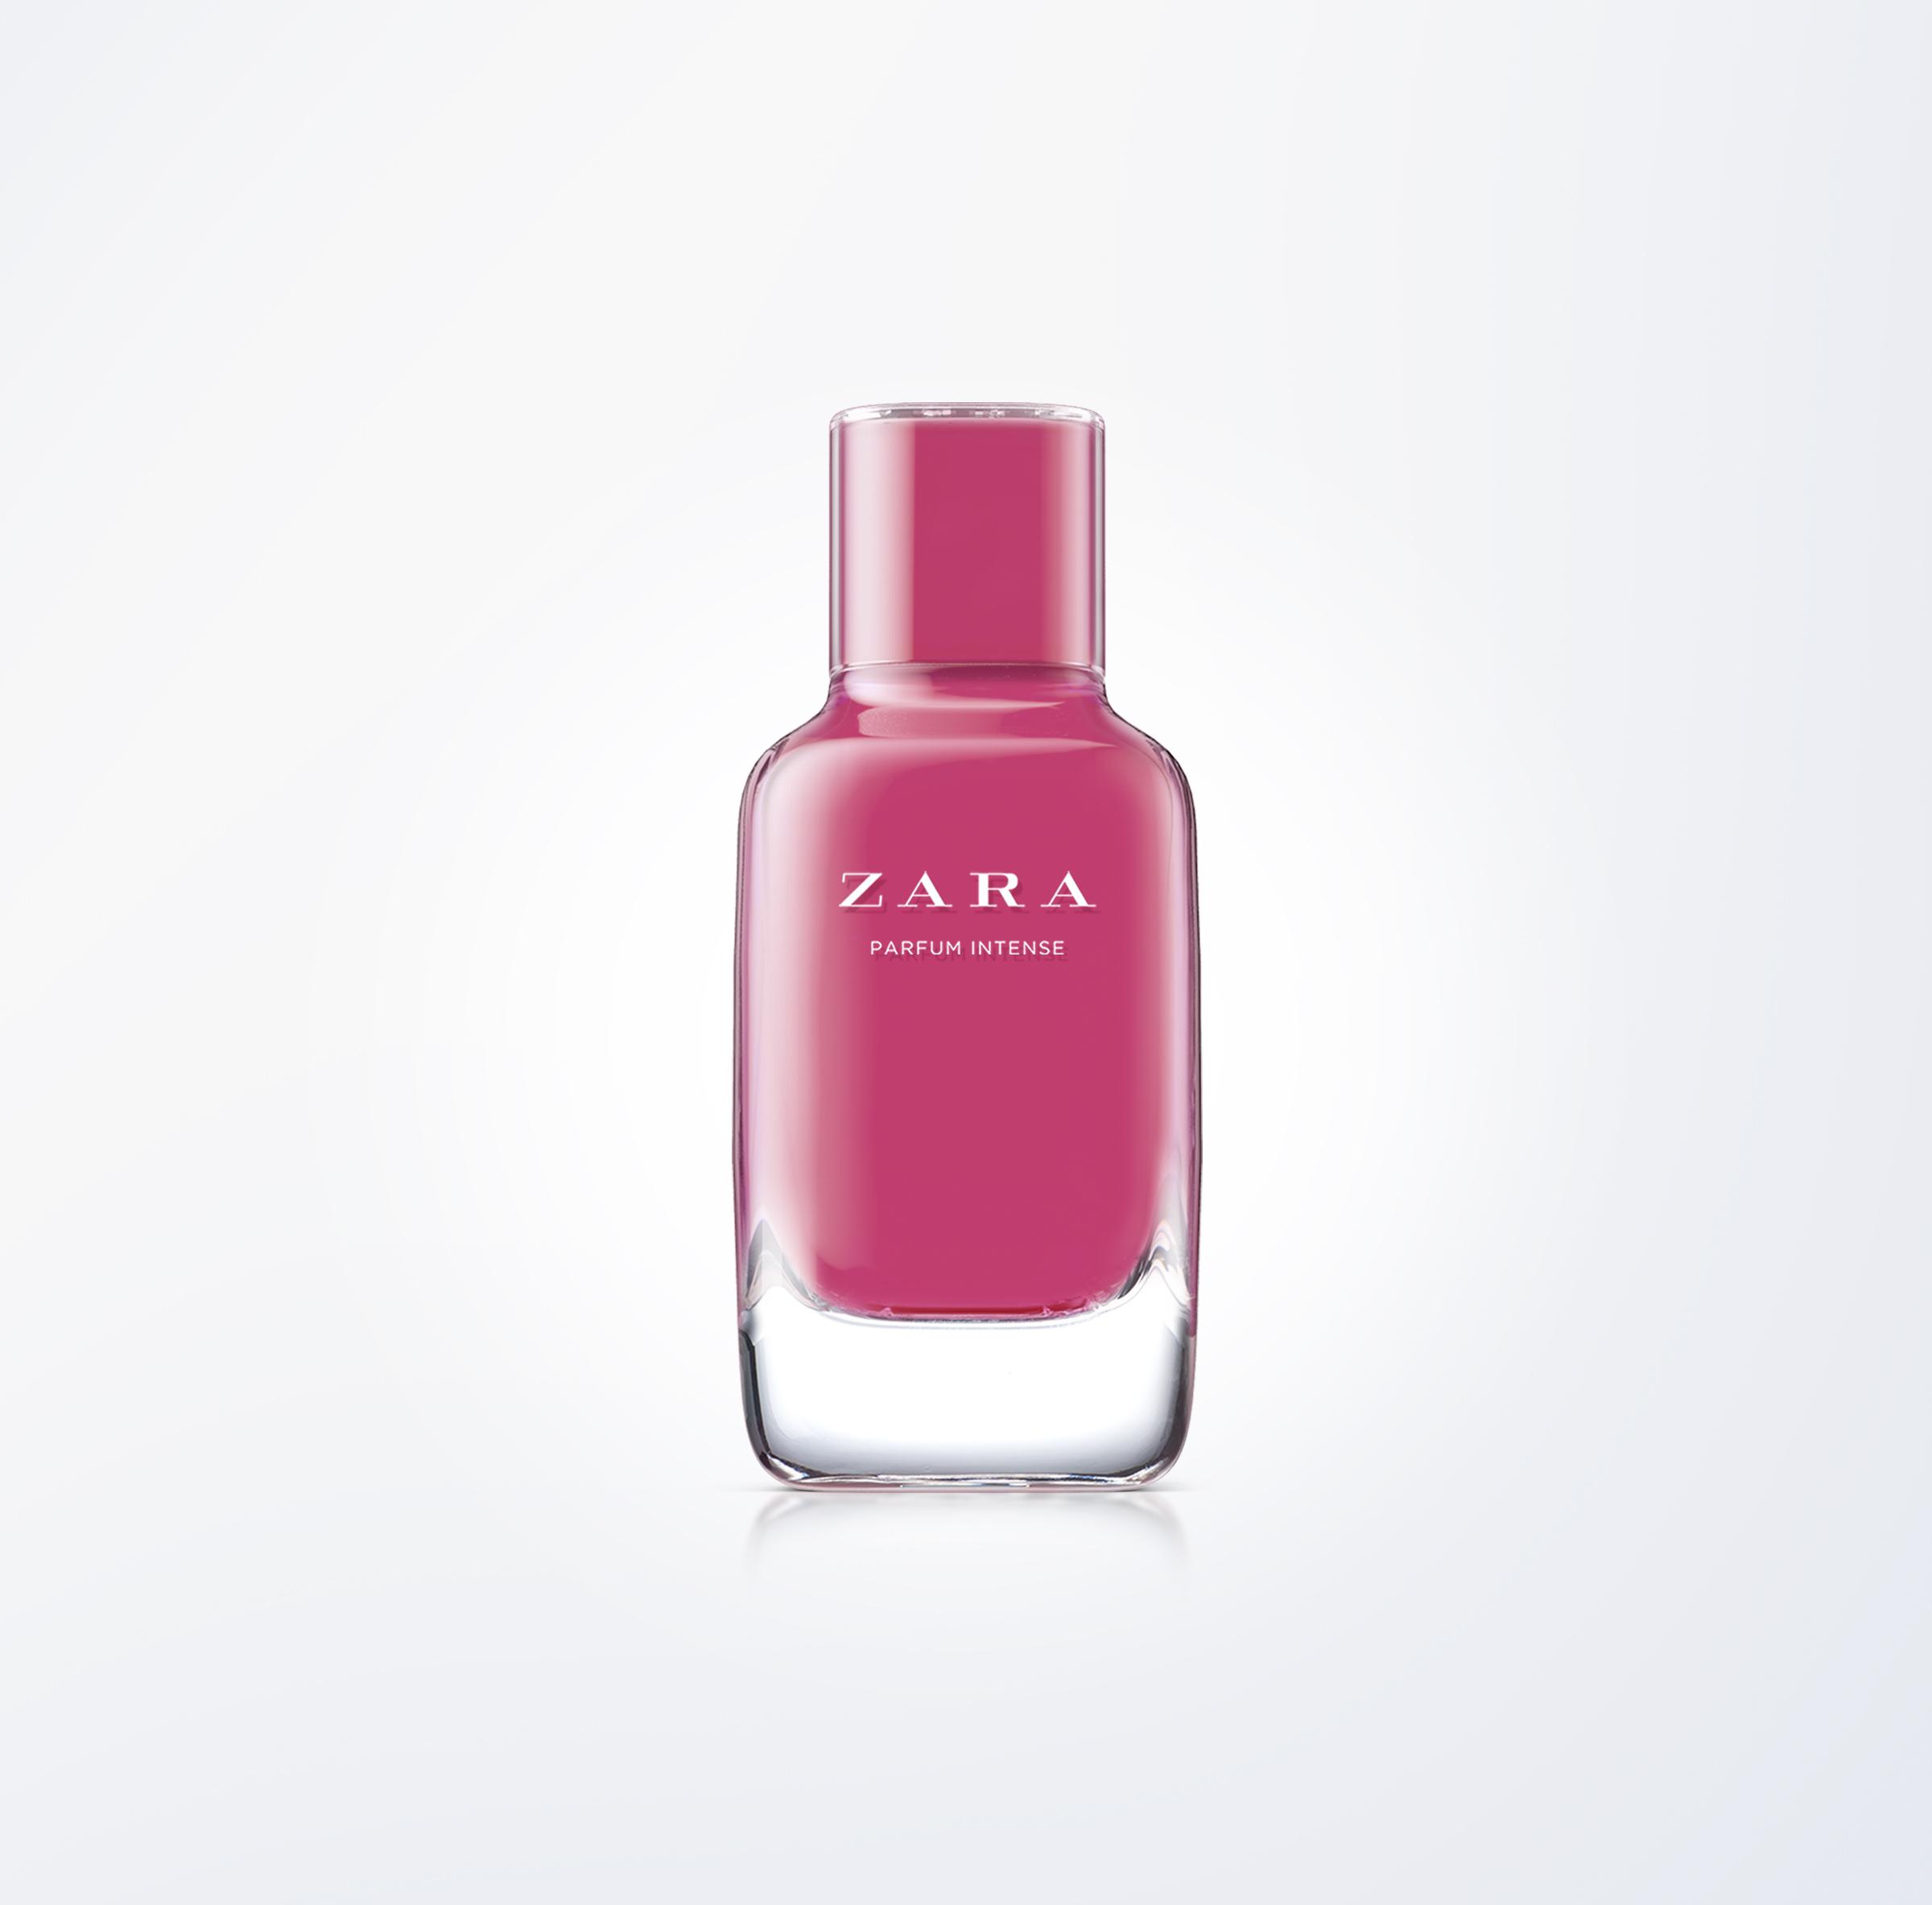 Lavernia & Cienfuegos - Zara Parfum Intense5.jpg